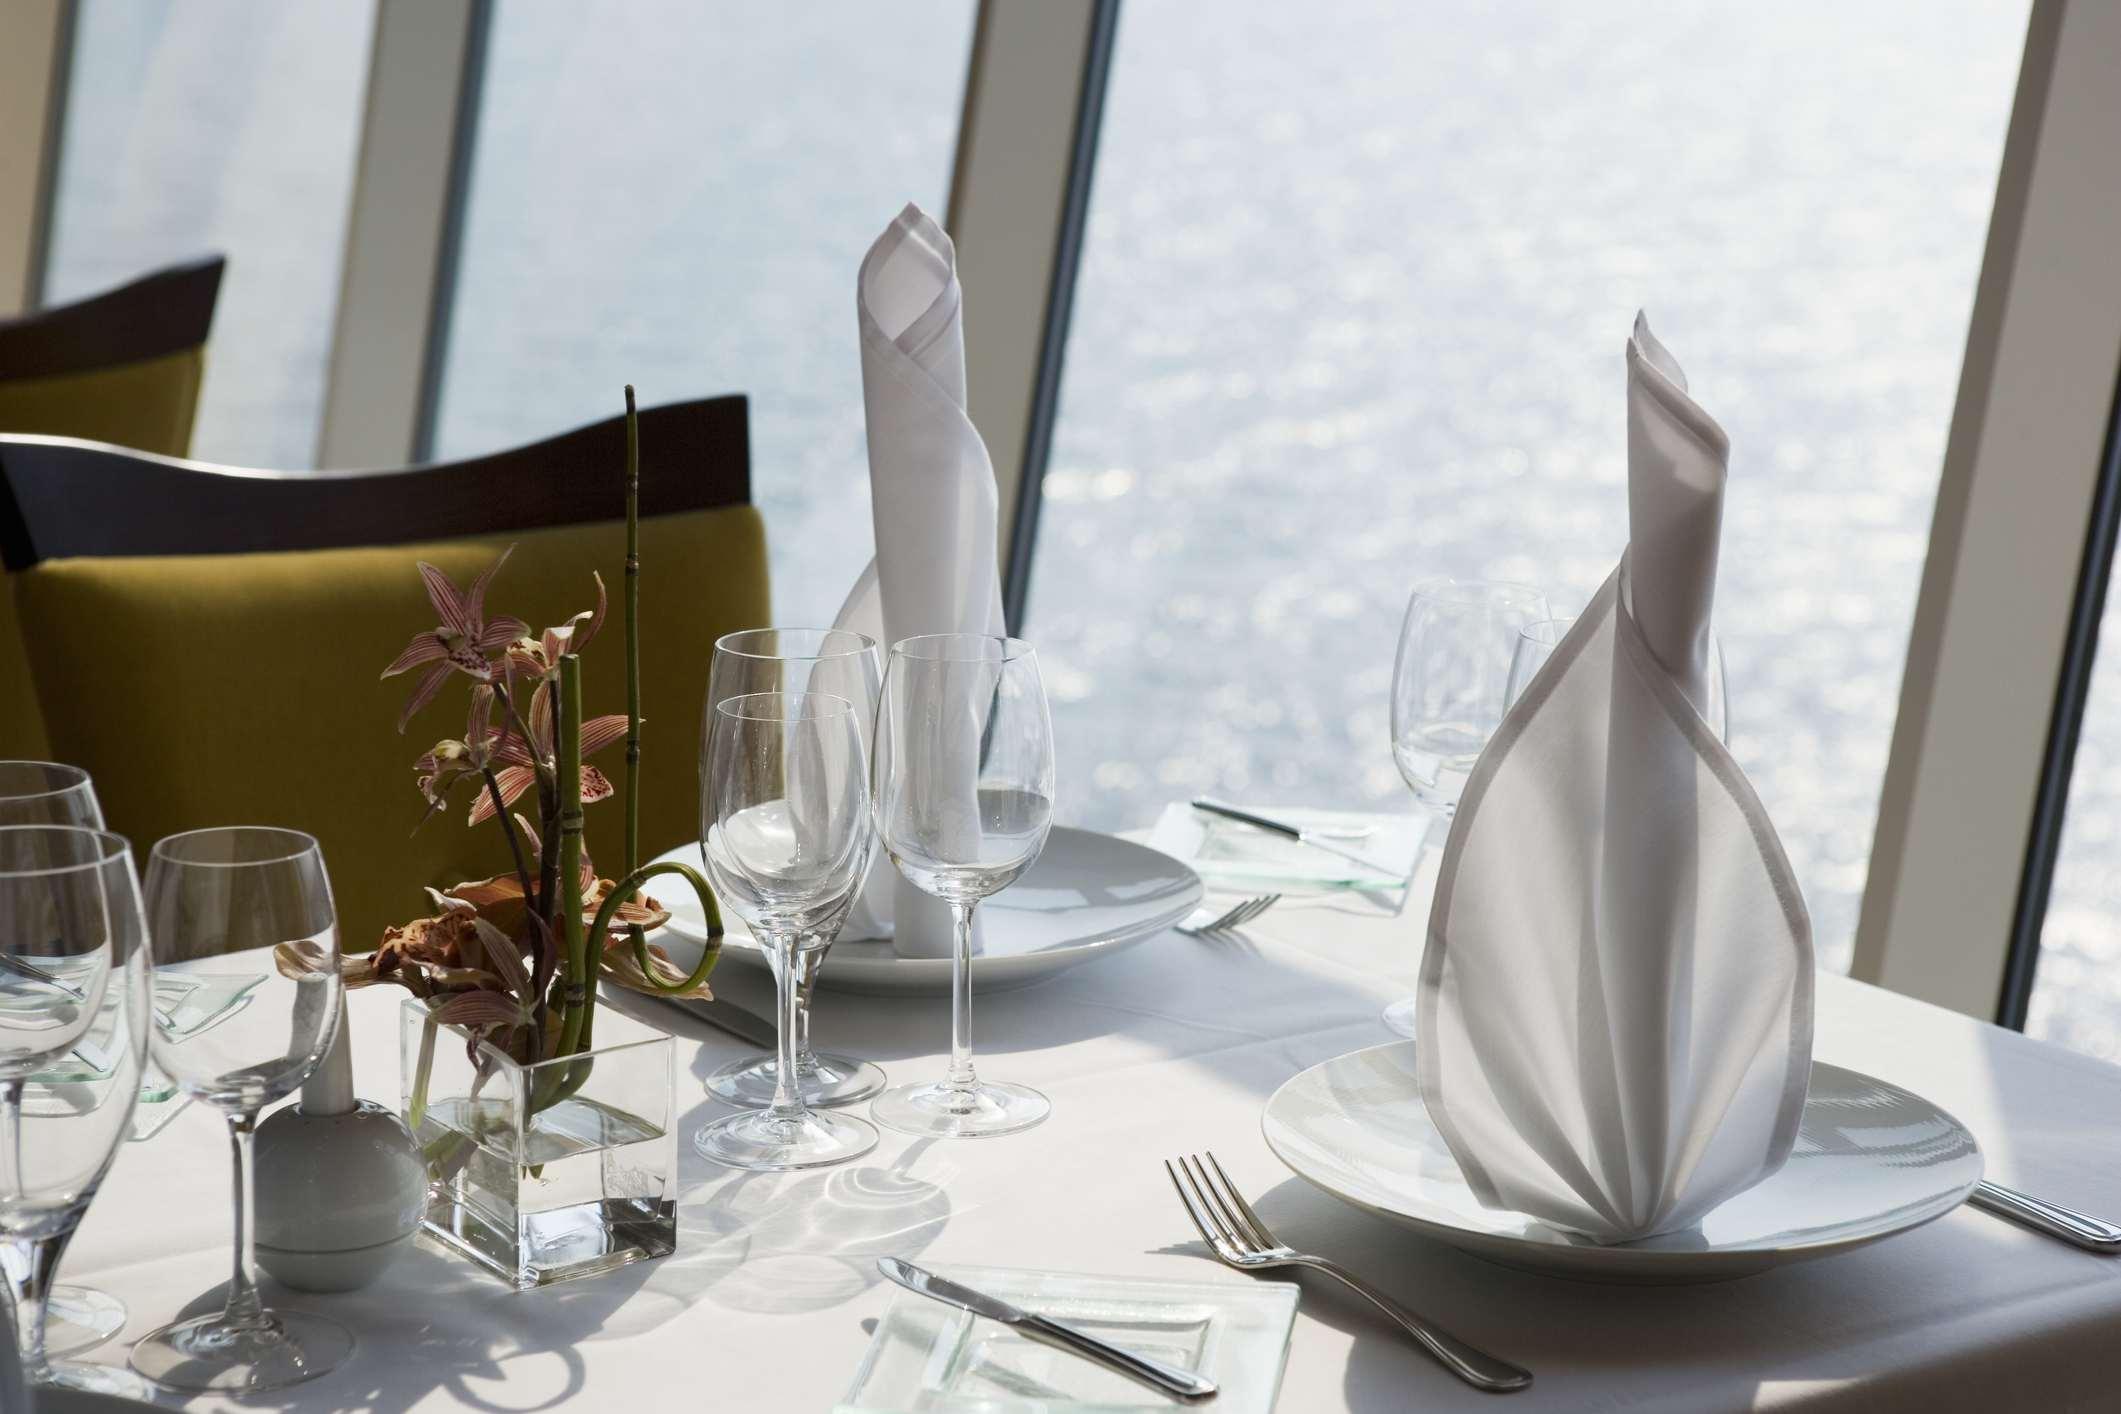 Cruise ship dining